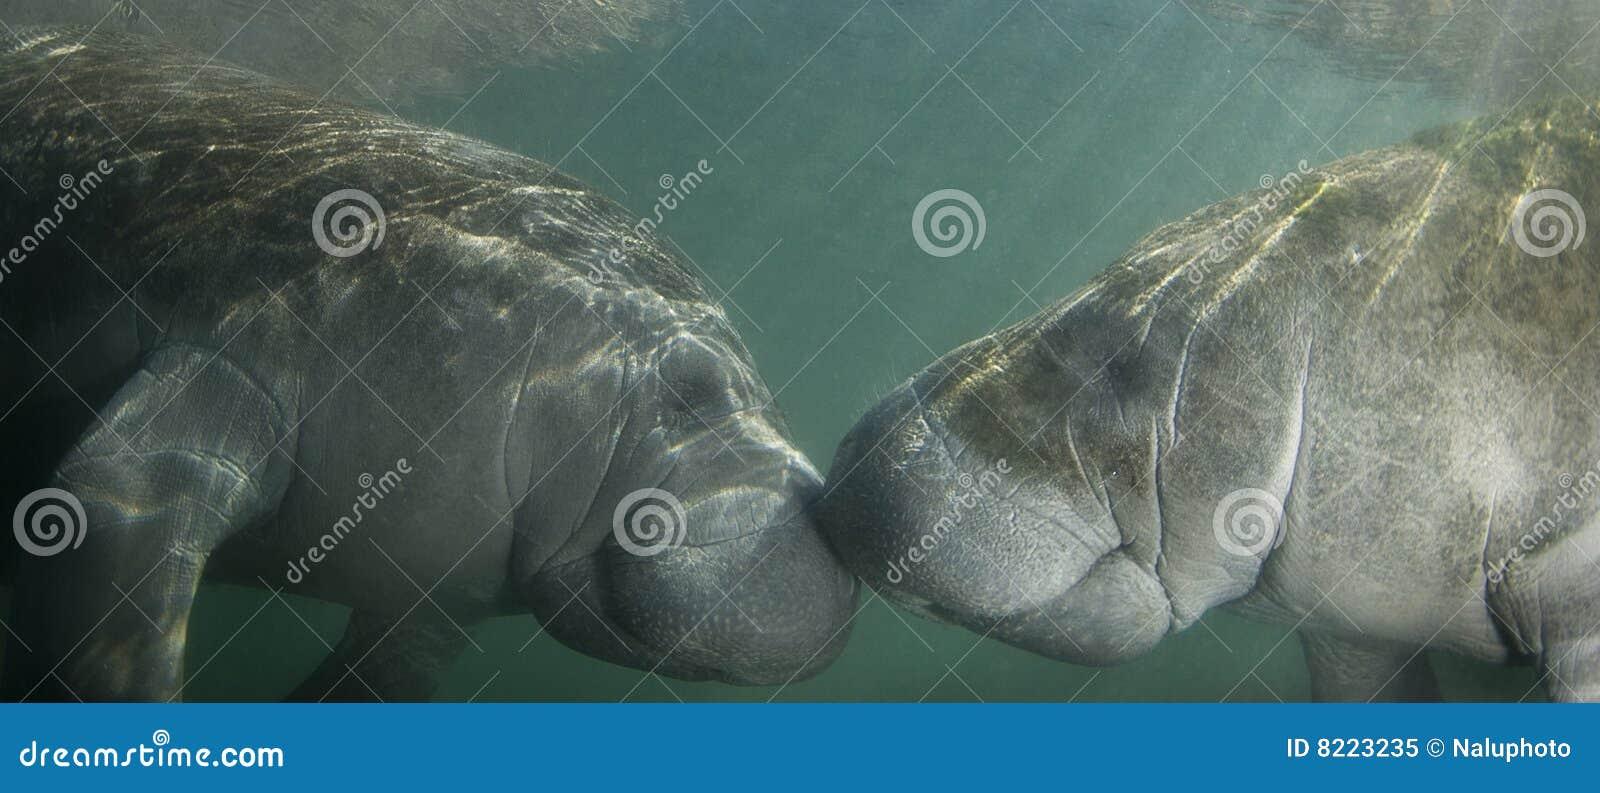 Kissing Manatees